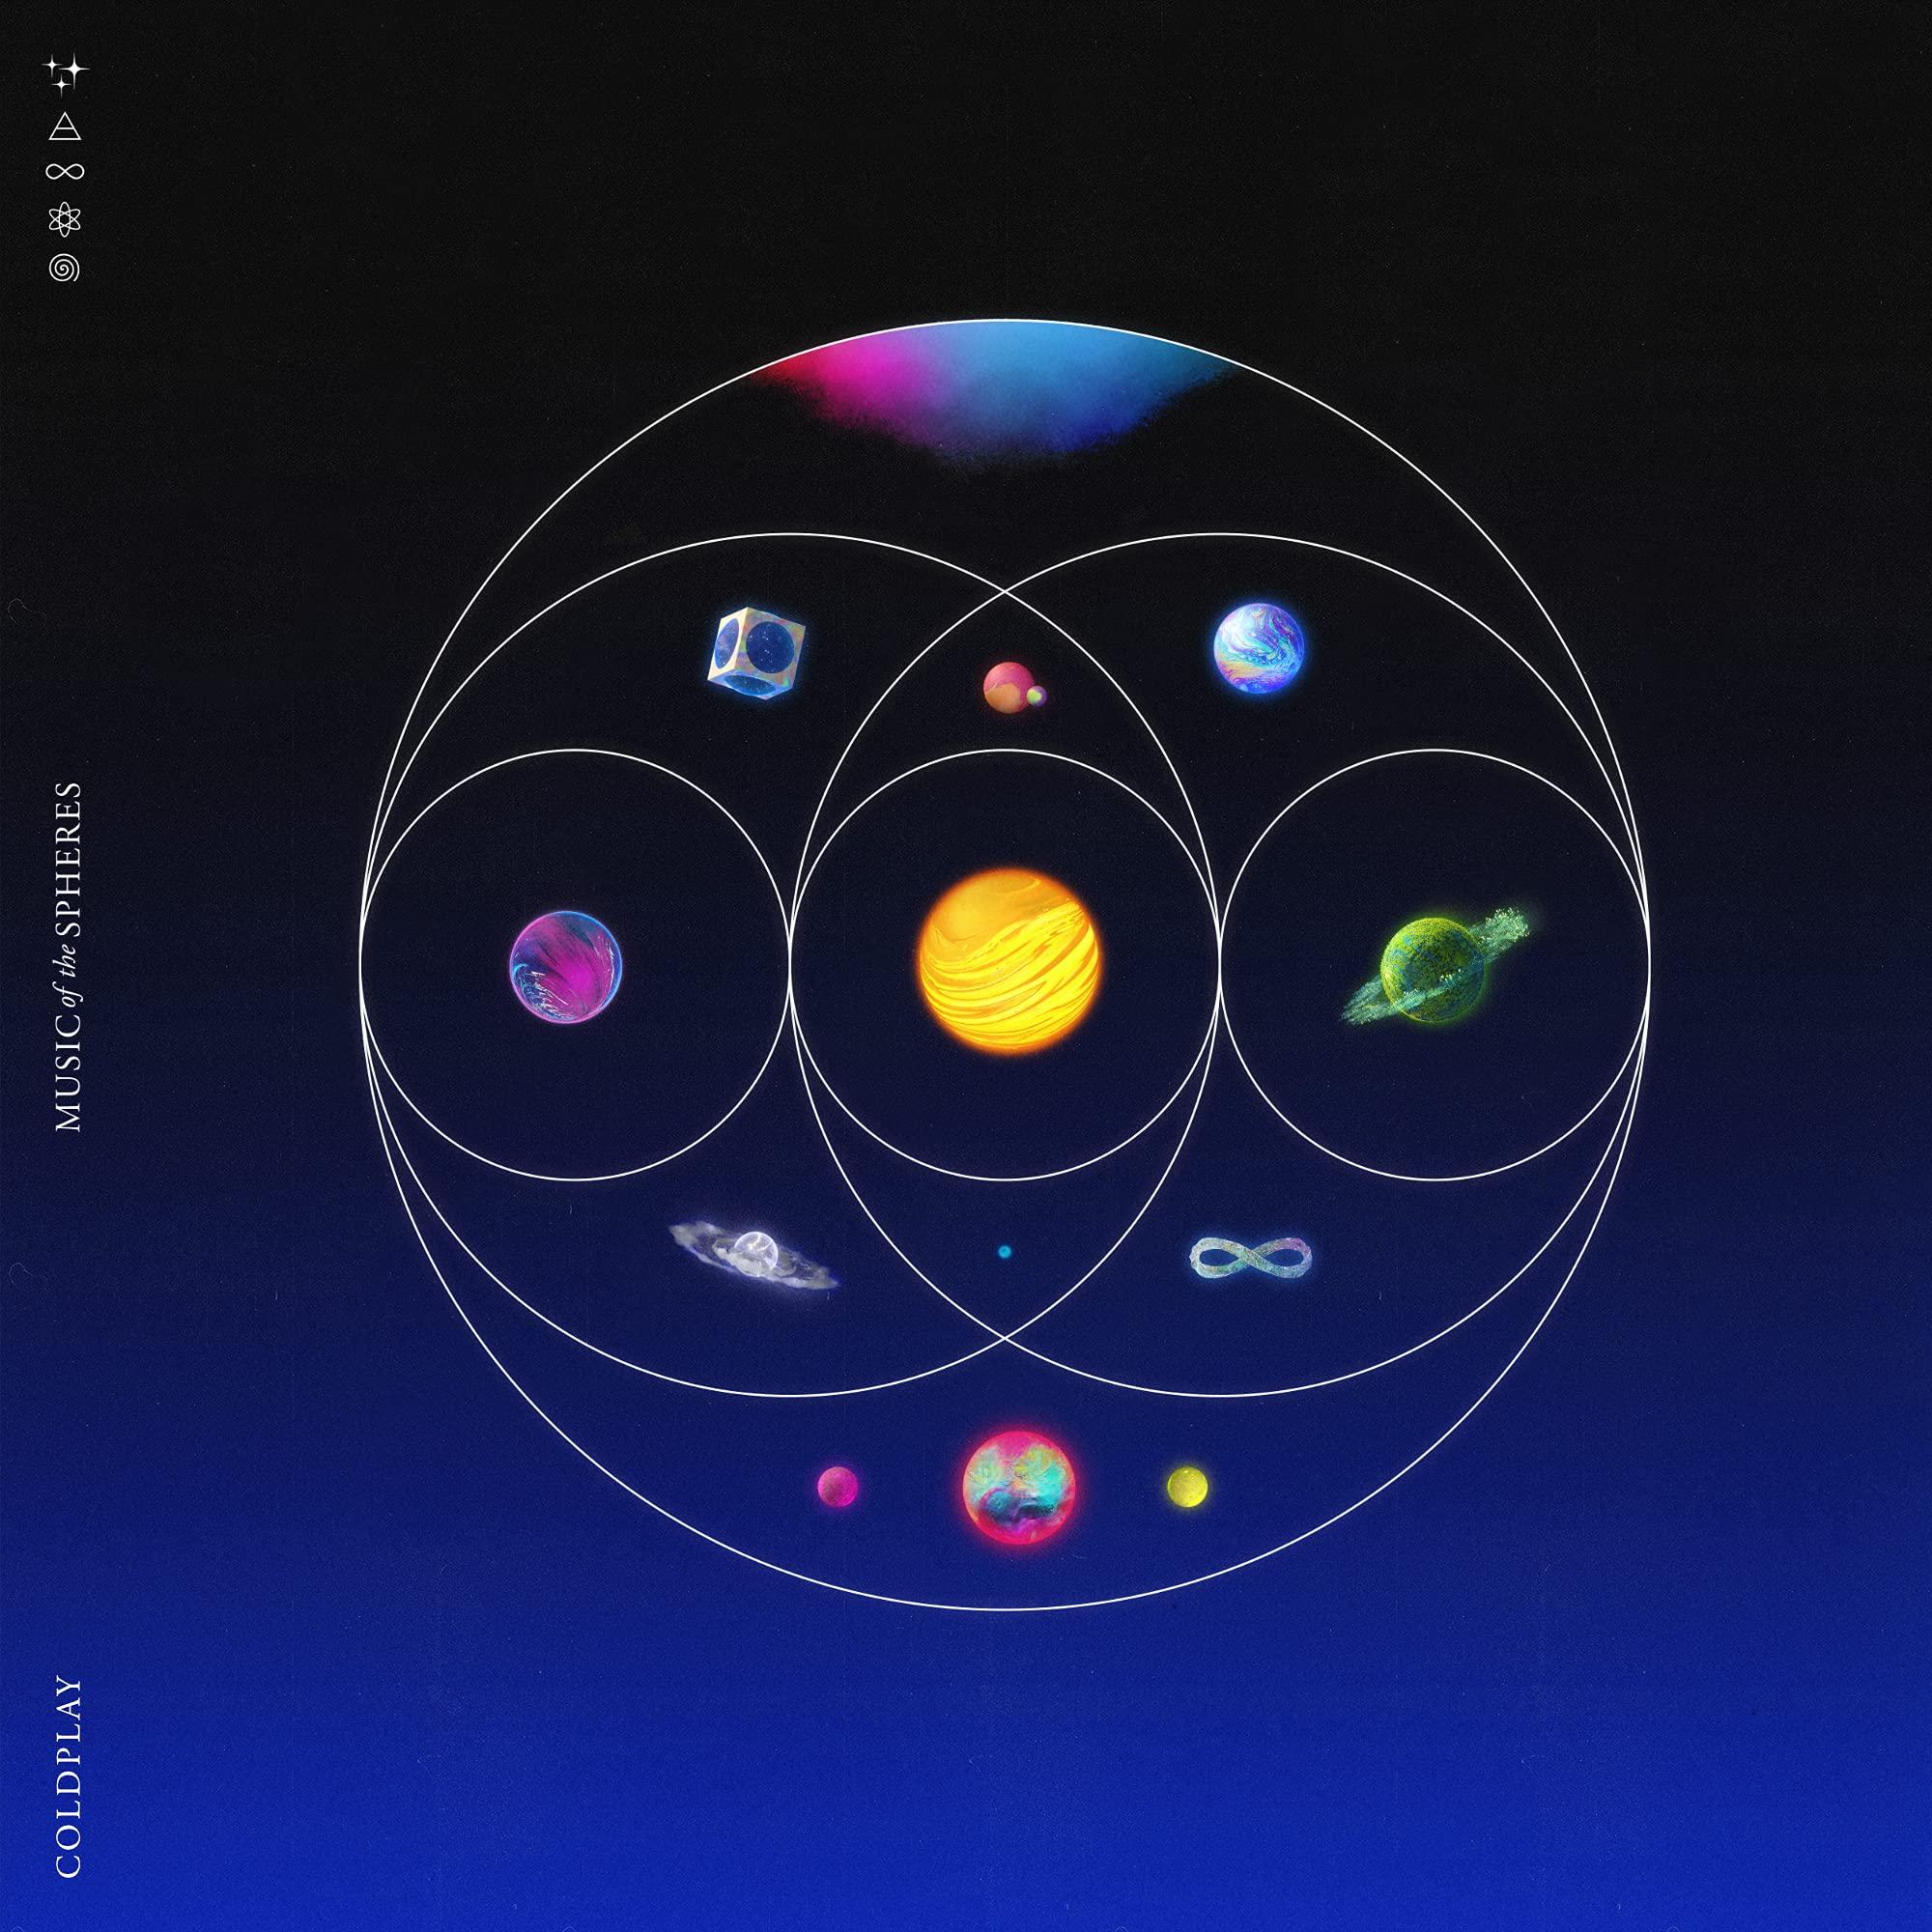 COLDPLAY - MUSIC OF THE SPHERES - LP 180 GR. (LP)